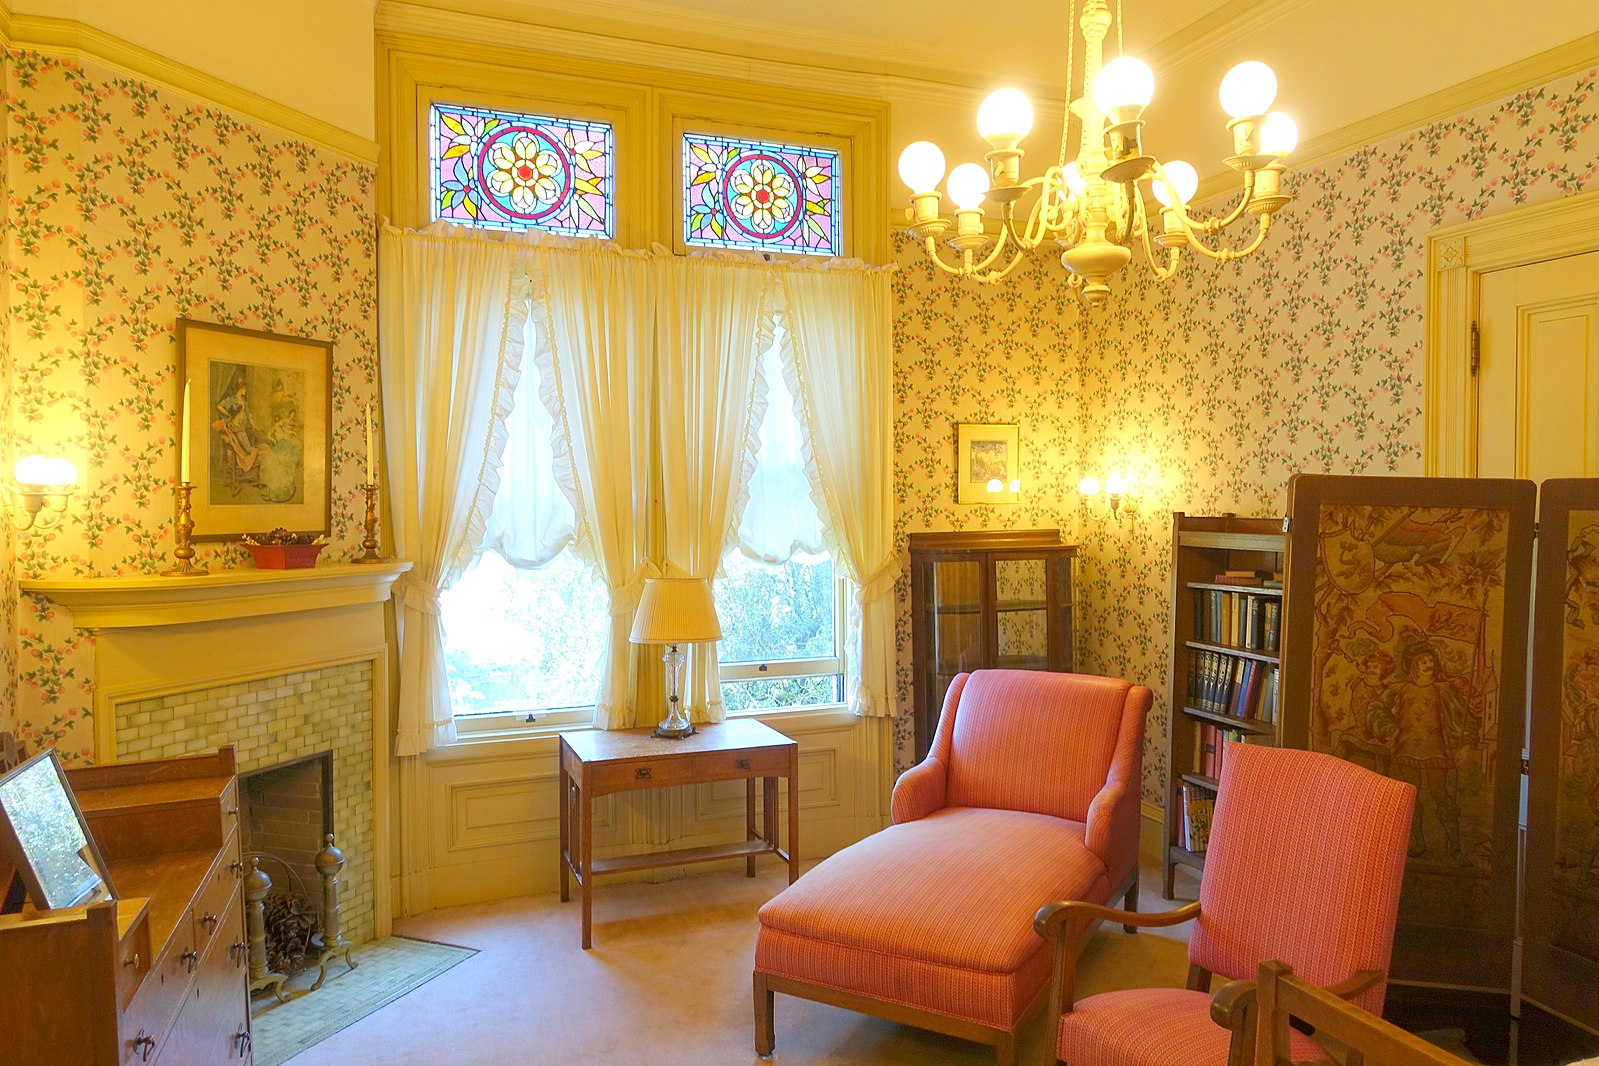 1599px-Back_bedroom_-_Haas-Lilienthal_House_-_San_Francisco,_CA_-_DSC05082